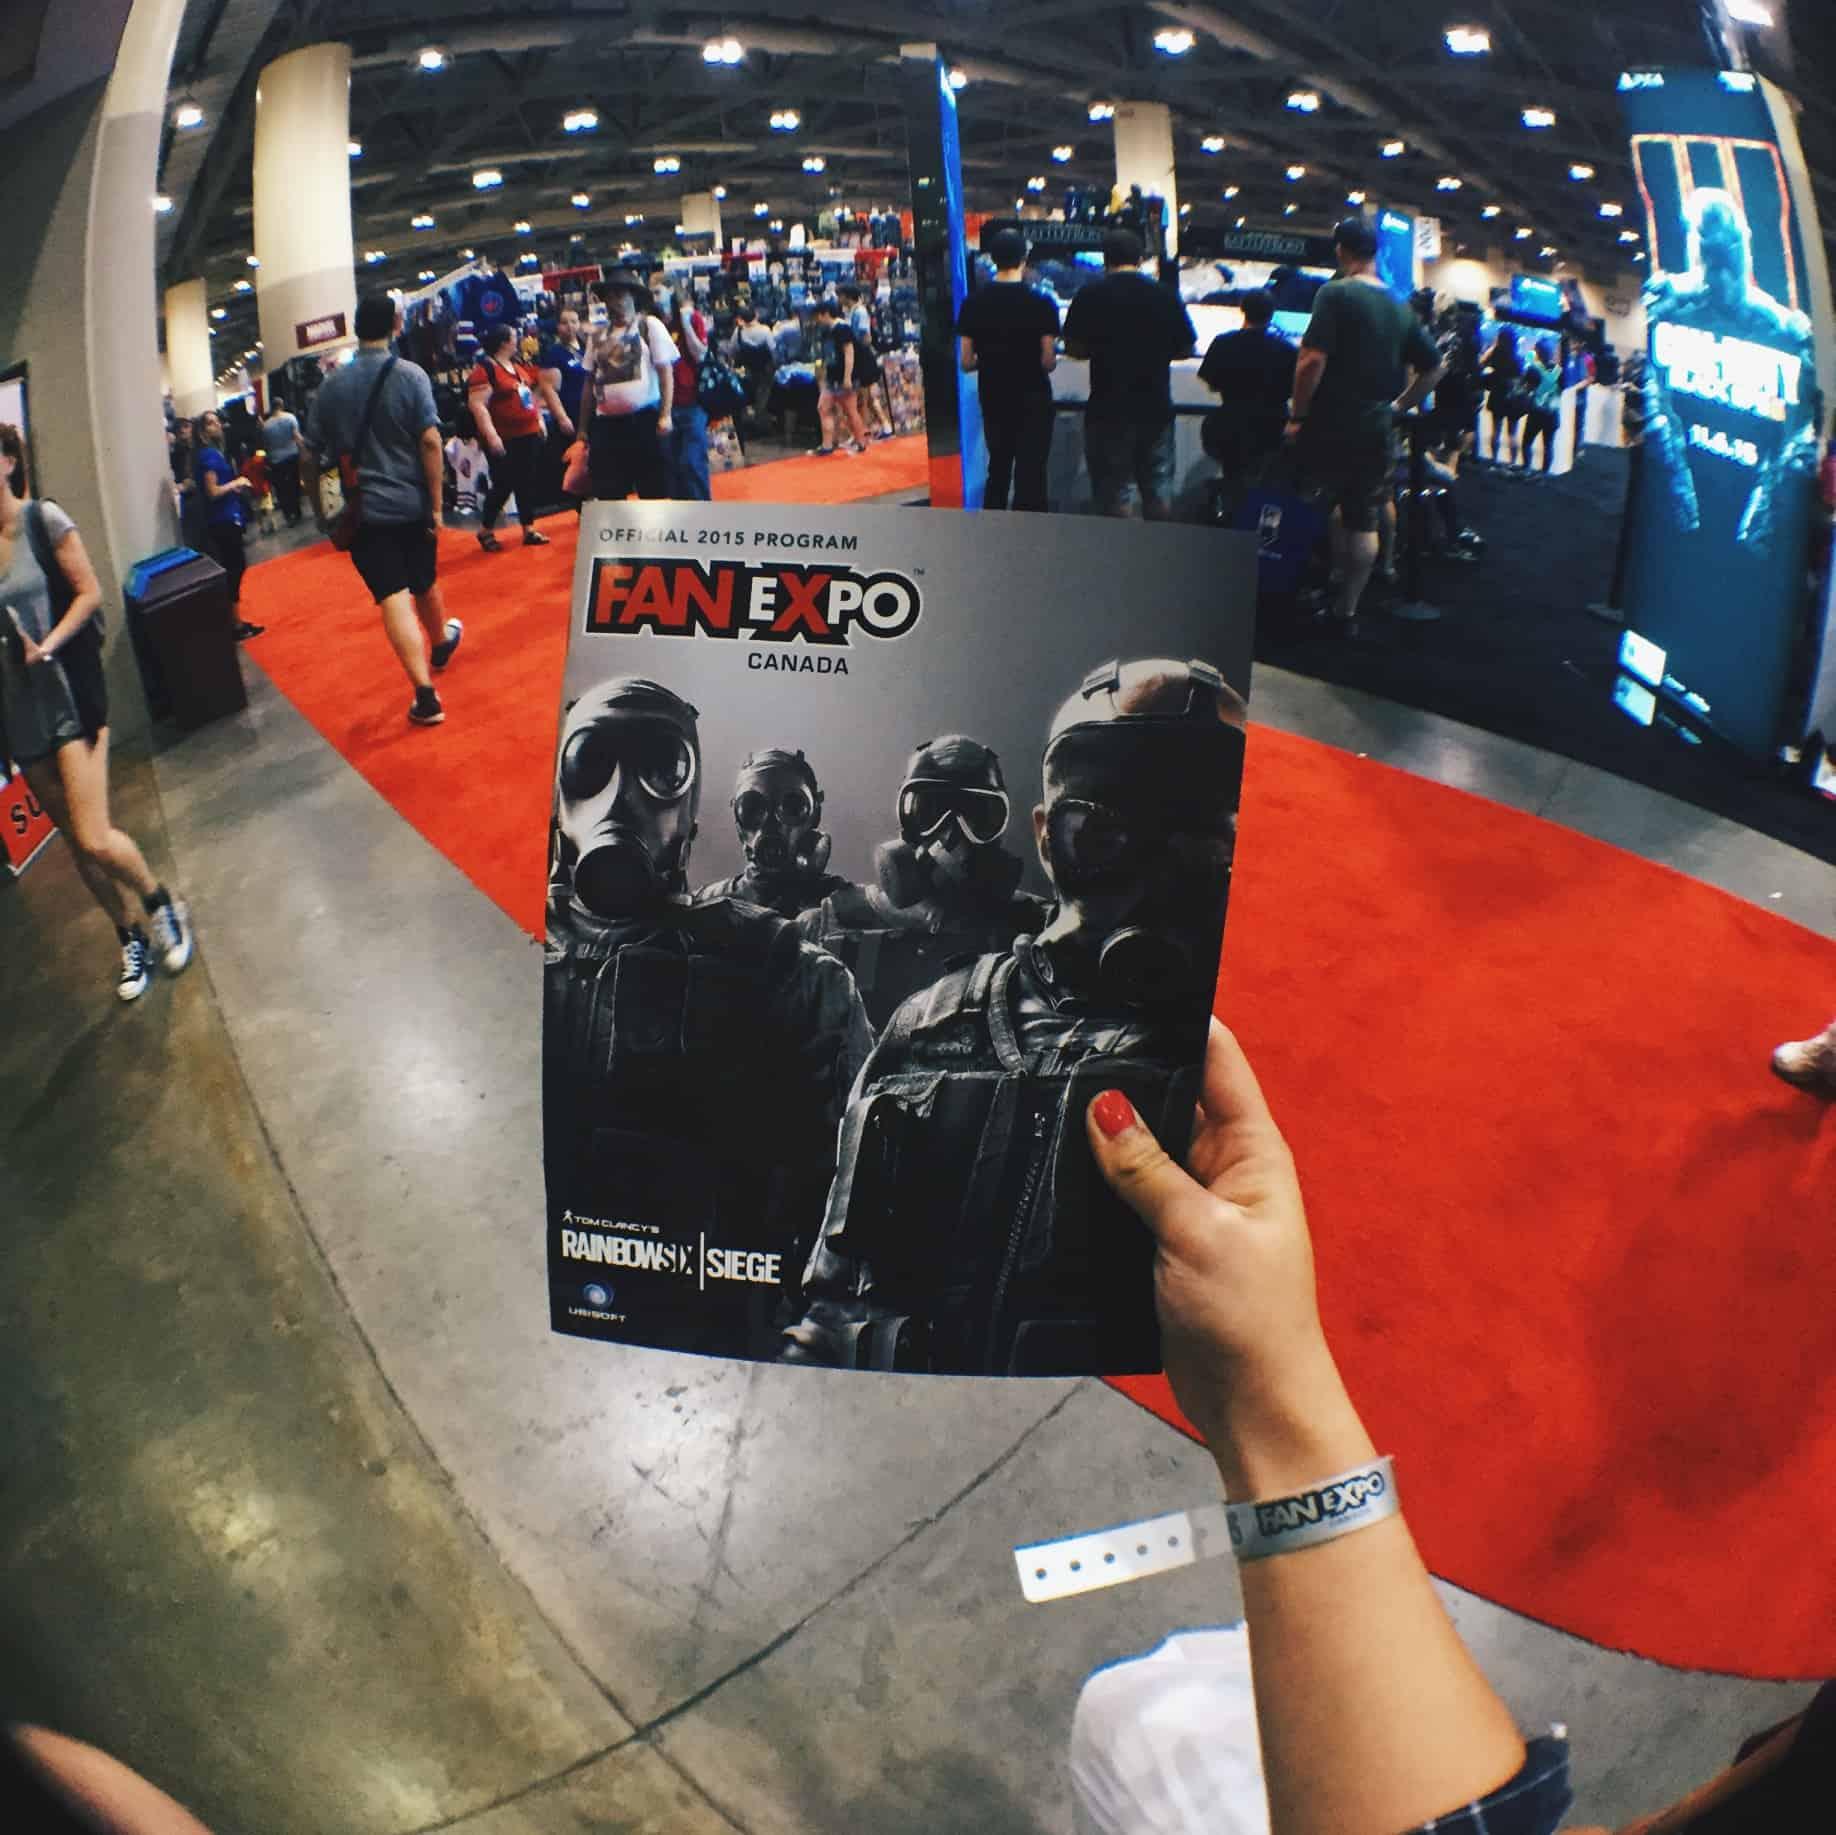 Fan Expo Canada at the Metro Toronto Convention Centre